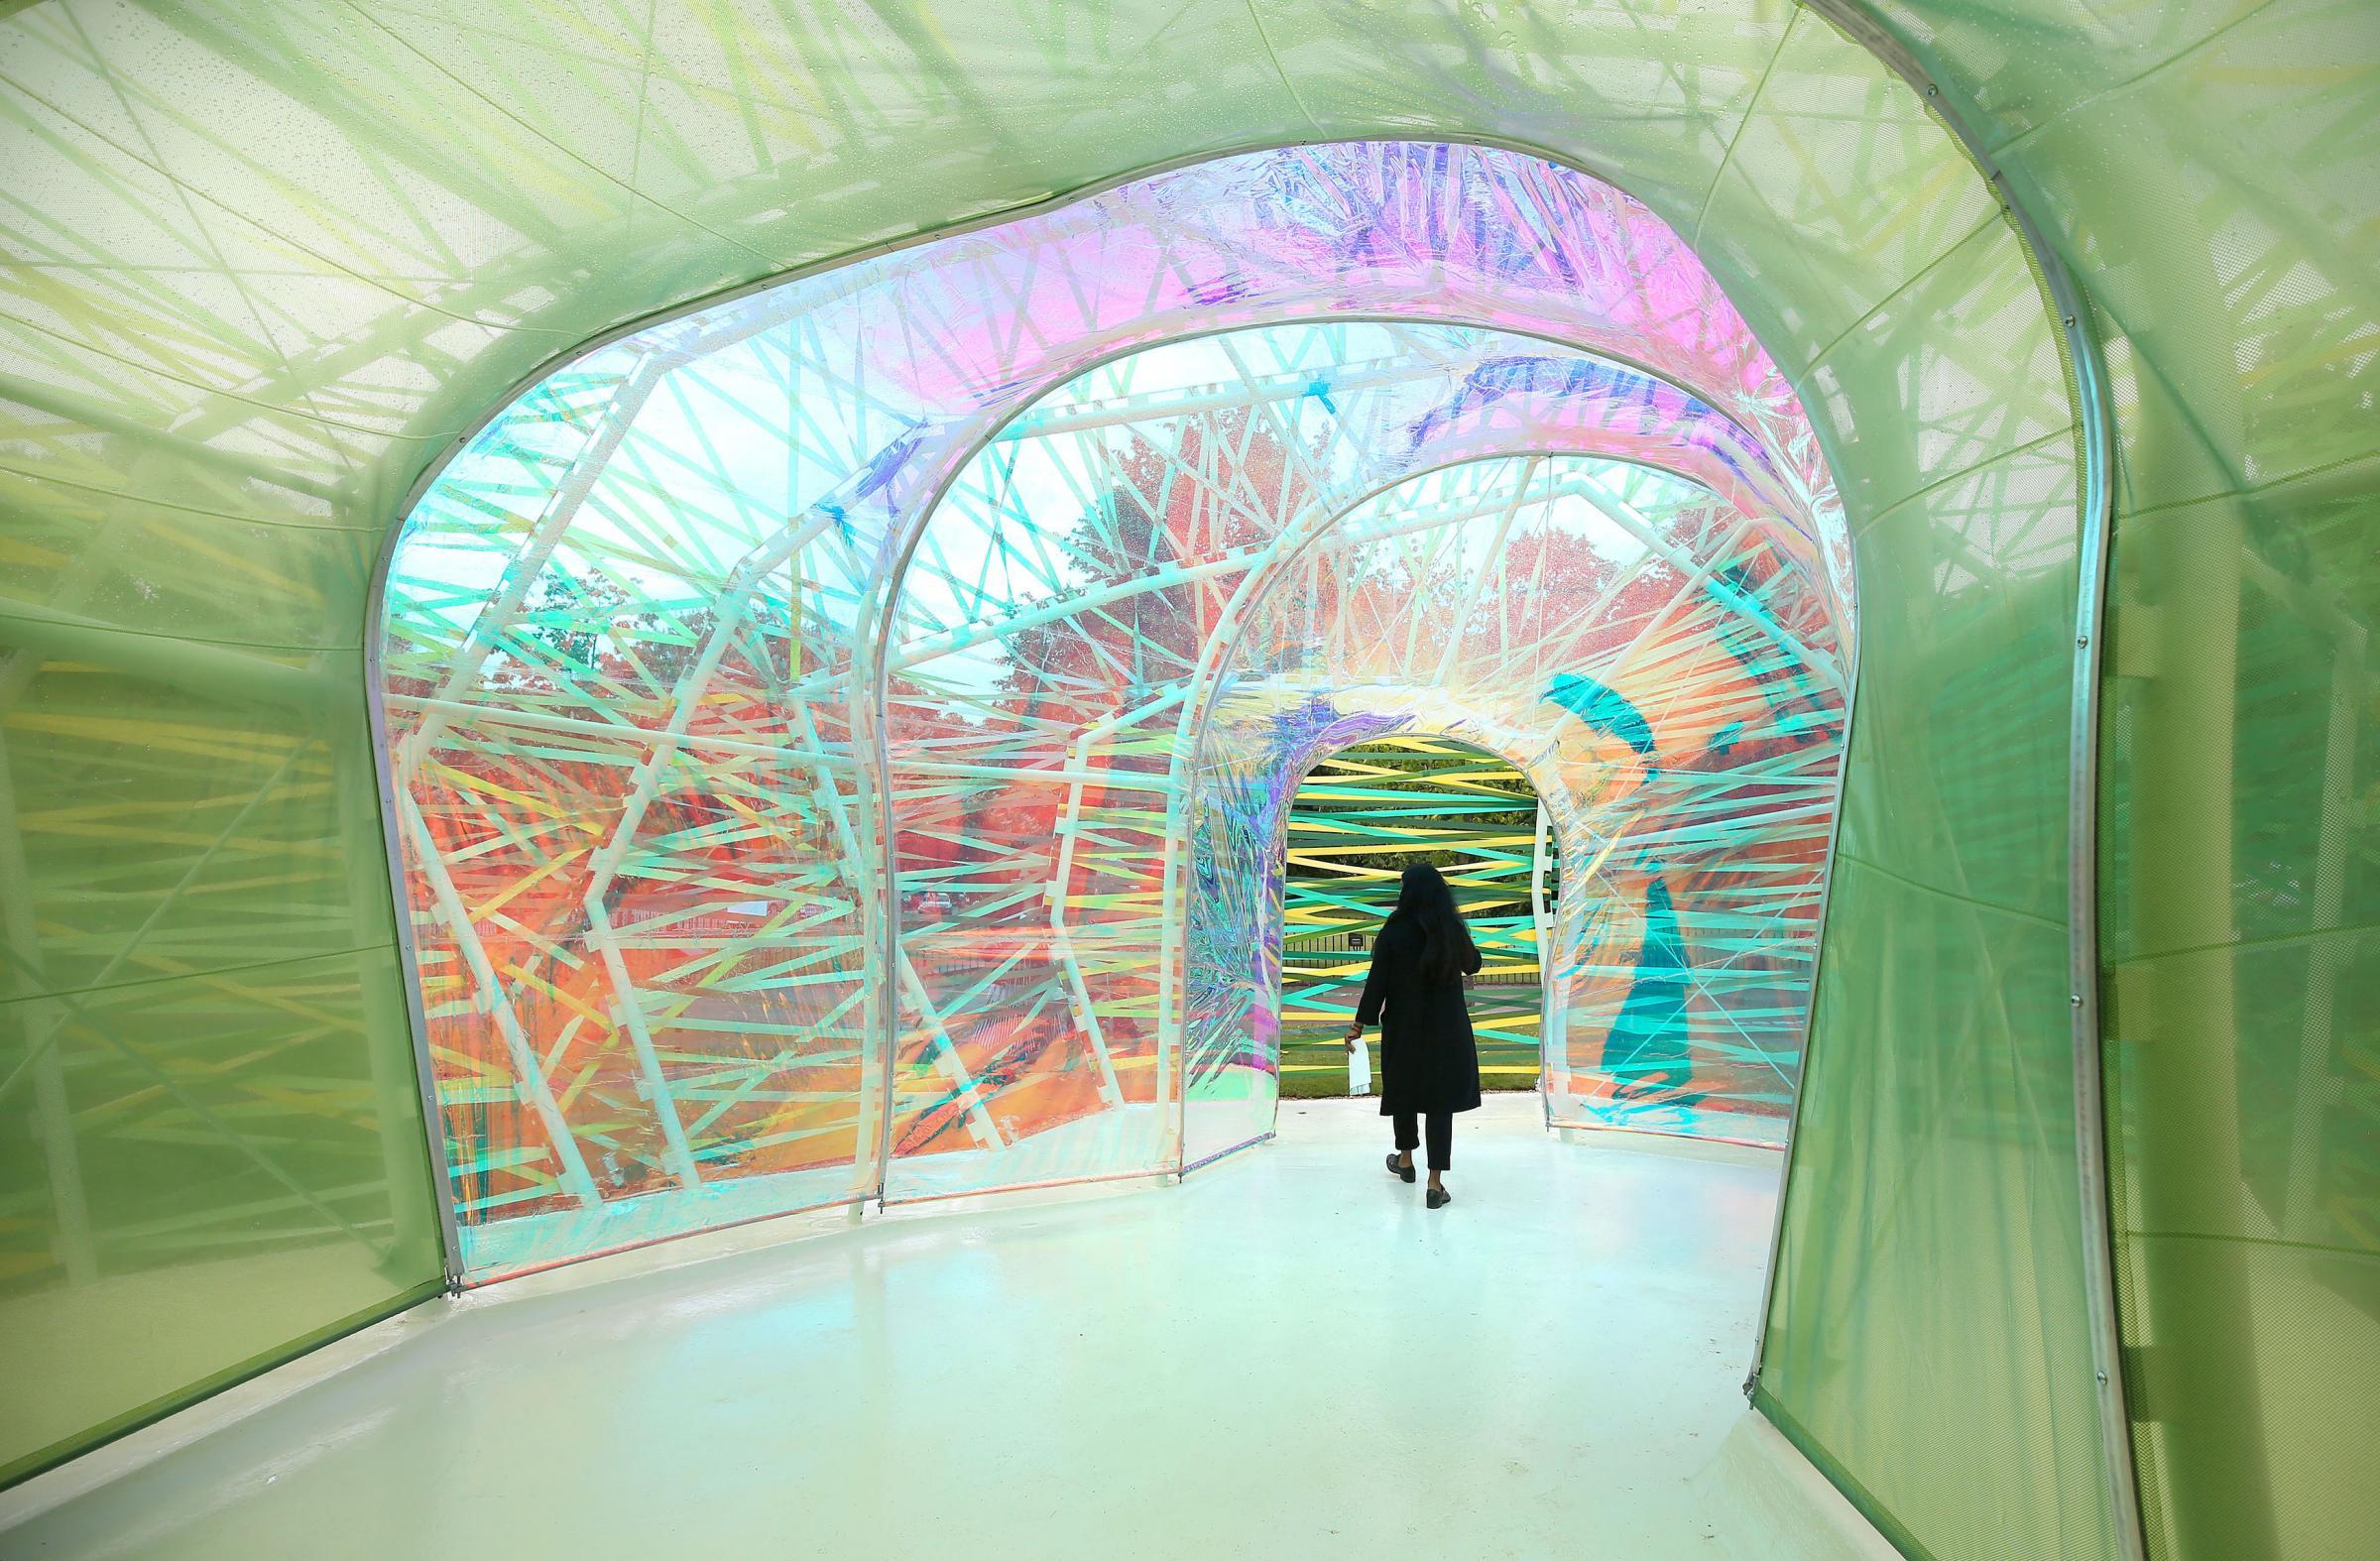 ... tent inspired by London Underground. Serpentine Galleryu0027s new multi-coloured summer pavilion in Kensington Gardens & Serpentine Galleryu0027s new summer pavilion in Kensington Gardens is ...